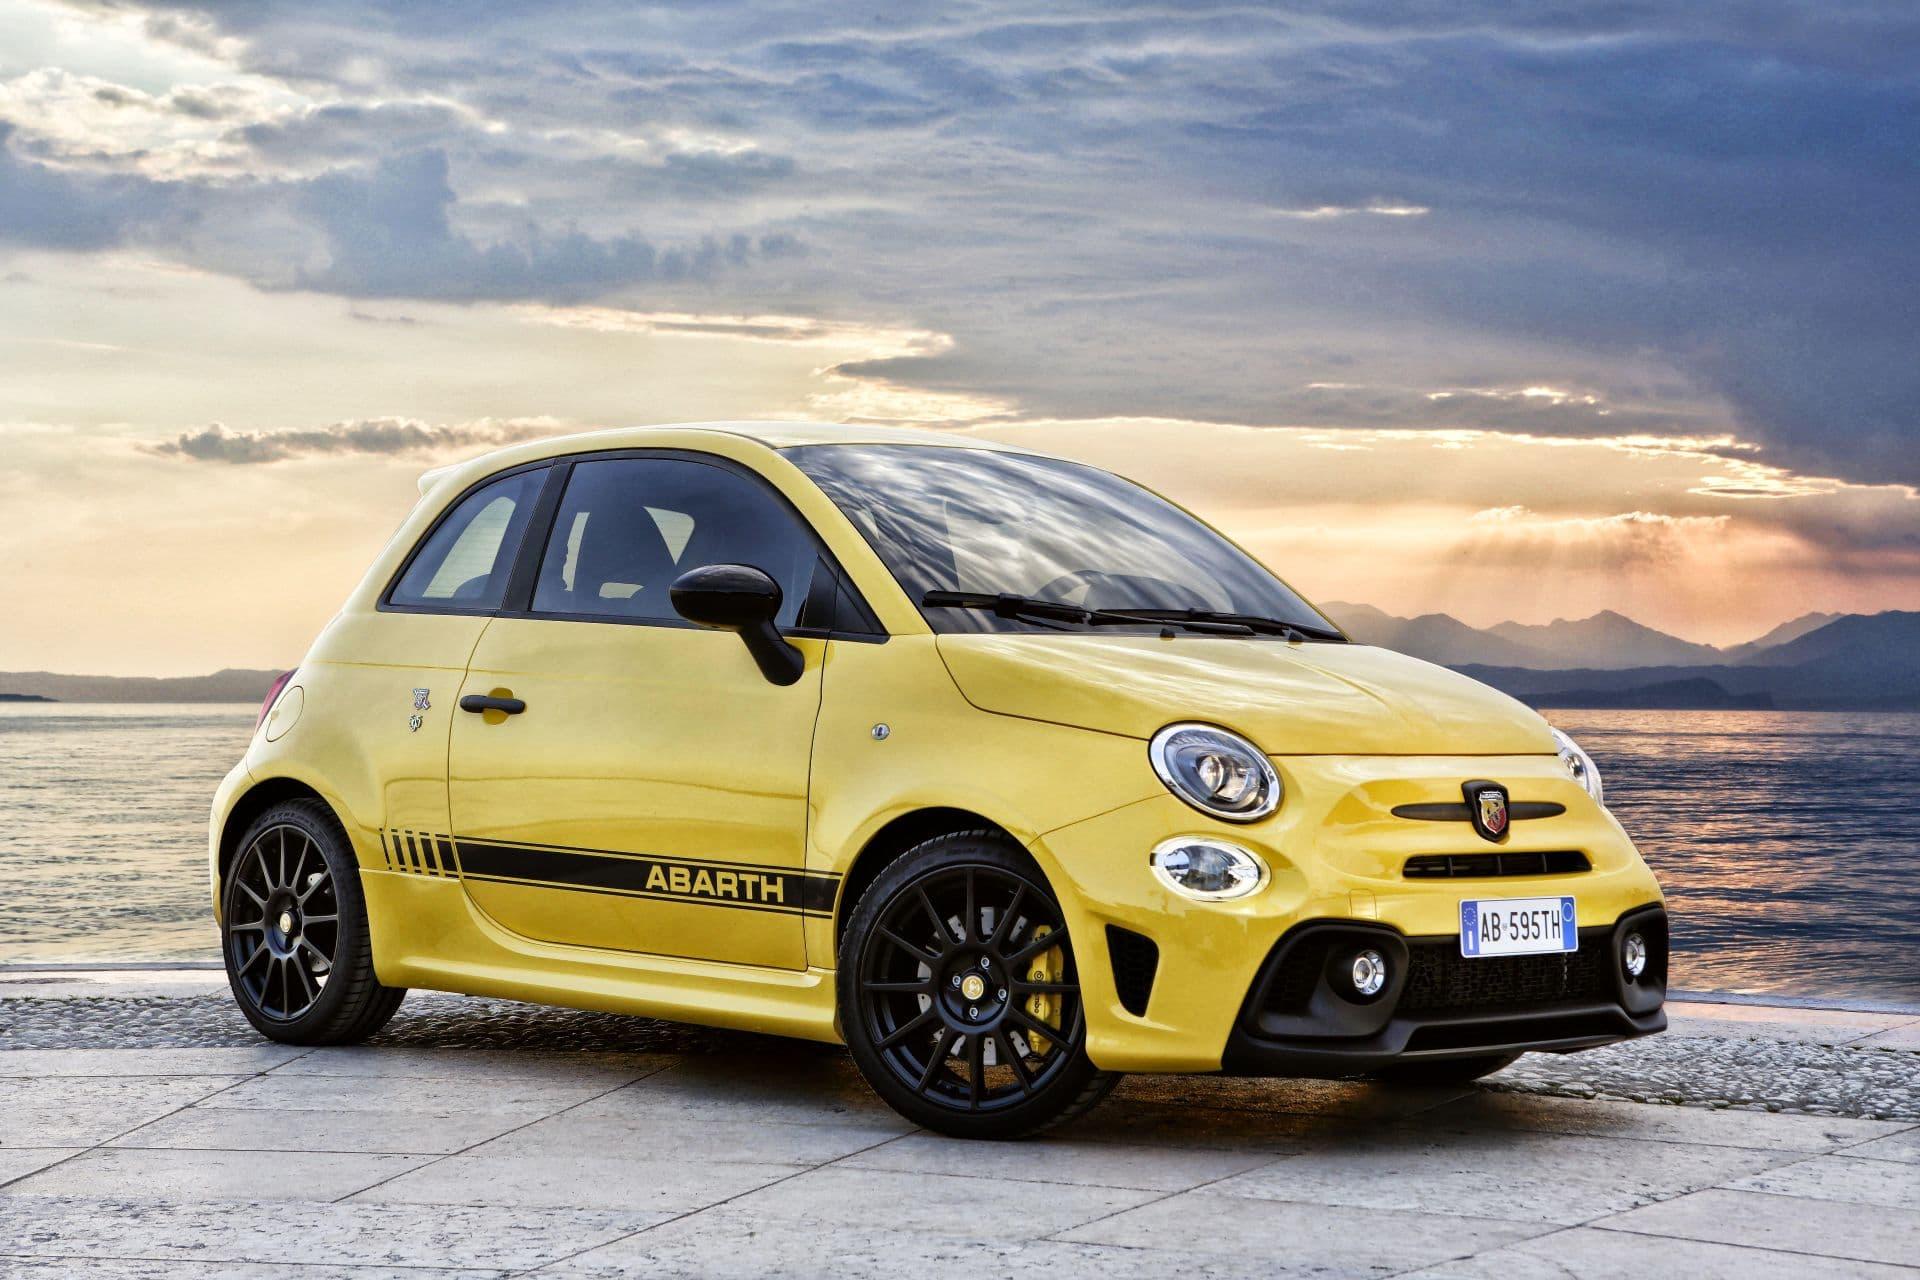 2020 Fiat 500 Abarth Spesification